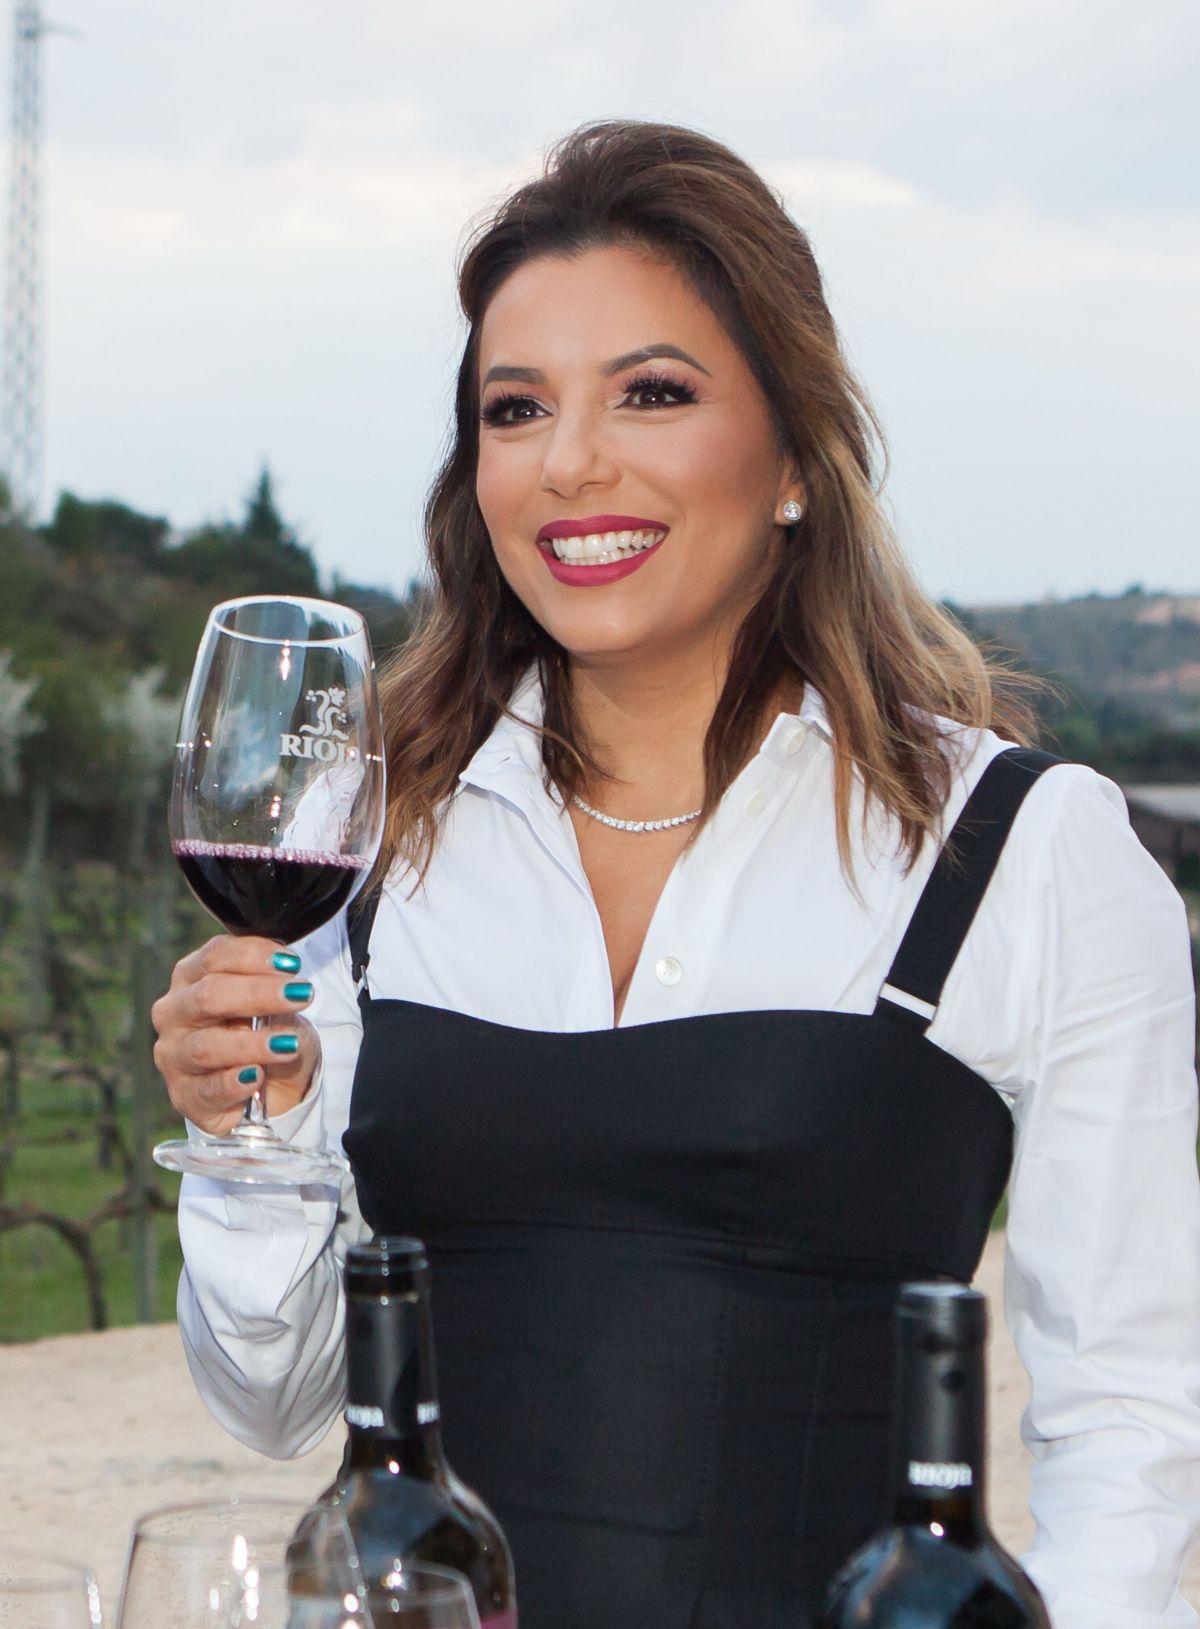 EVA LONGORIA at Marques De Rsical Cellar in Elciego 04/05/2017